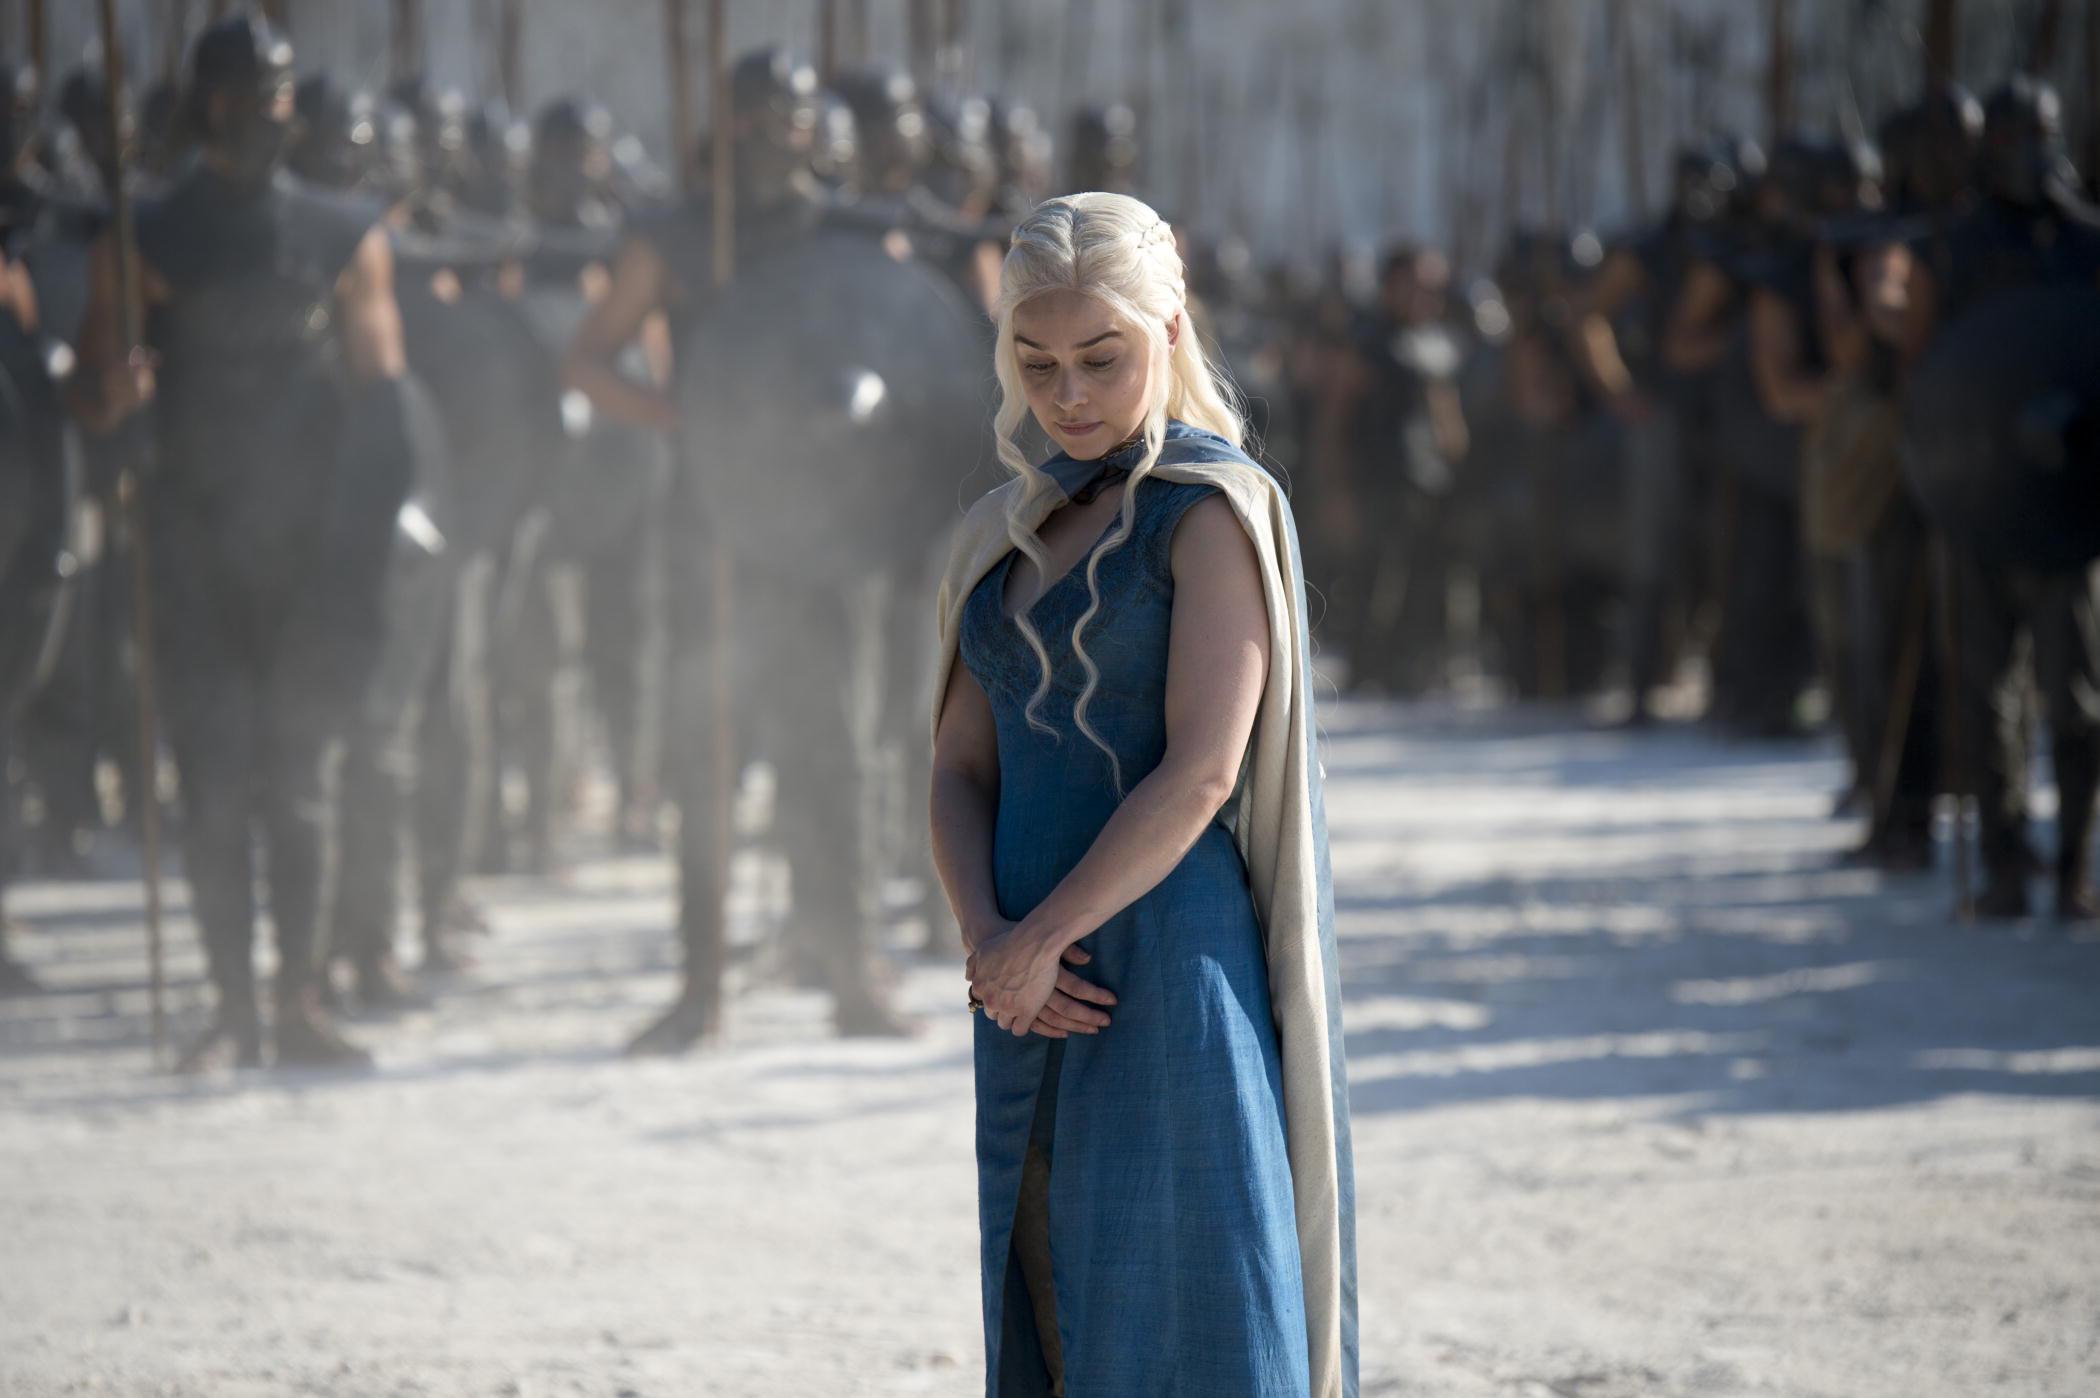 Daenerys Tagaryen in Season 3 of Game of Thrones